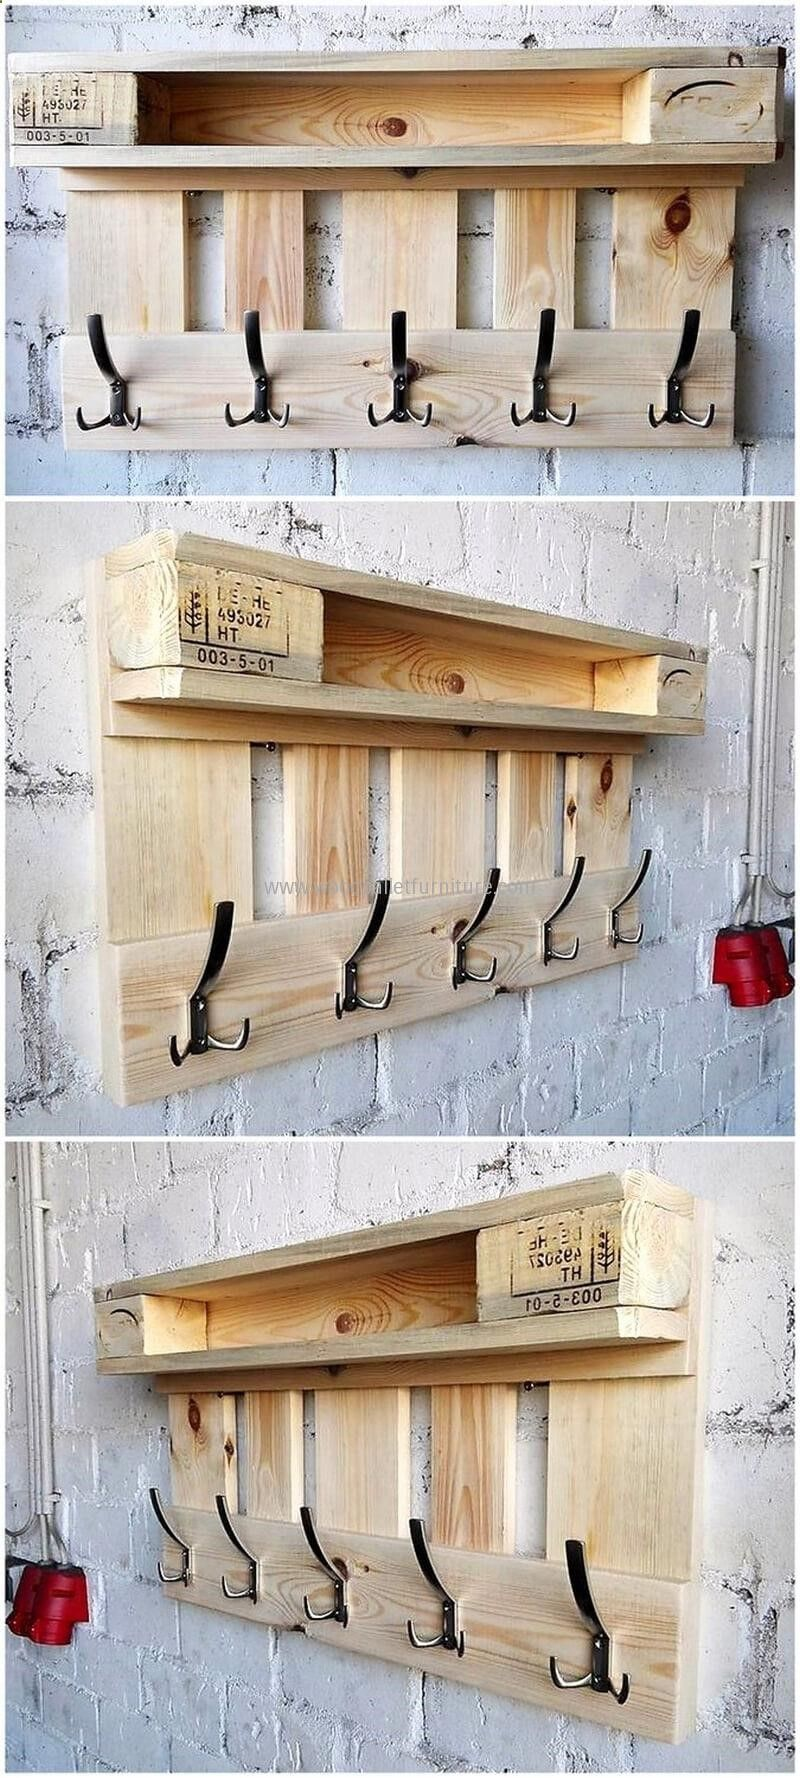 Amazing Shed Plans repurposed pallet hanger